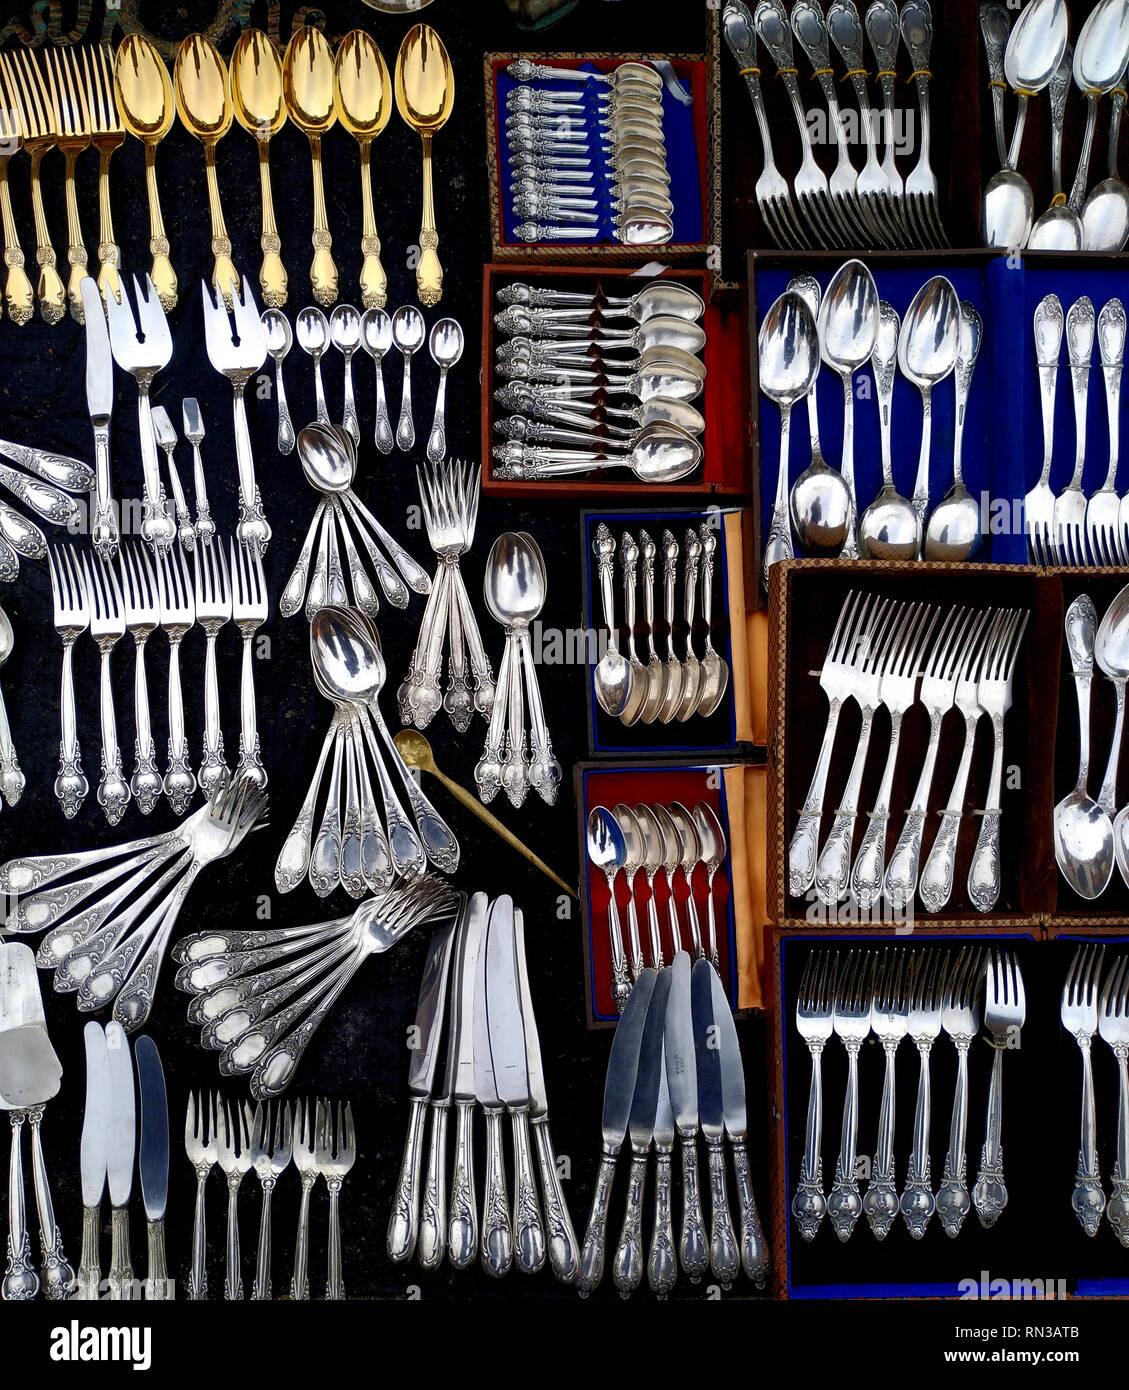 Old, vintage silver and german silver cutlery at the flea market, Ukraine, Kiev. Stock Photo